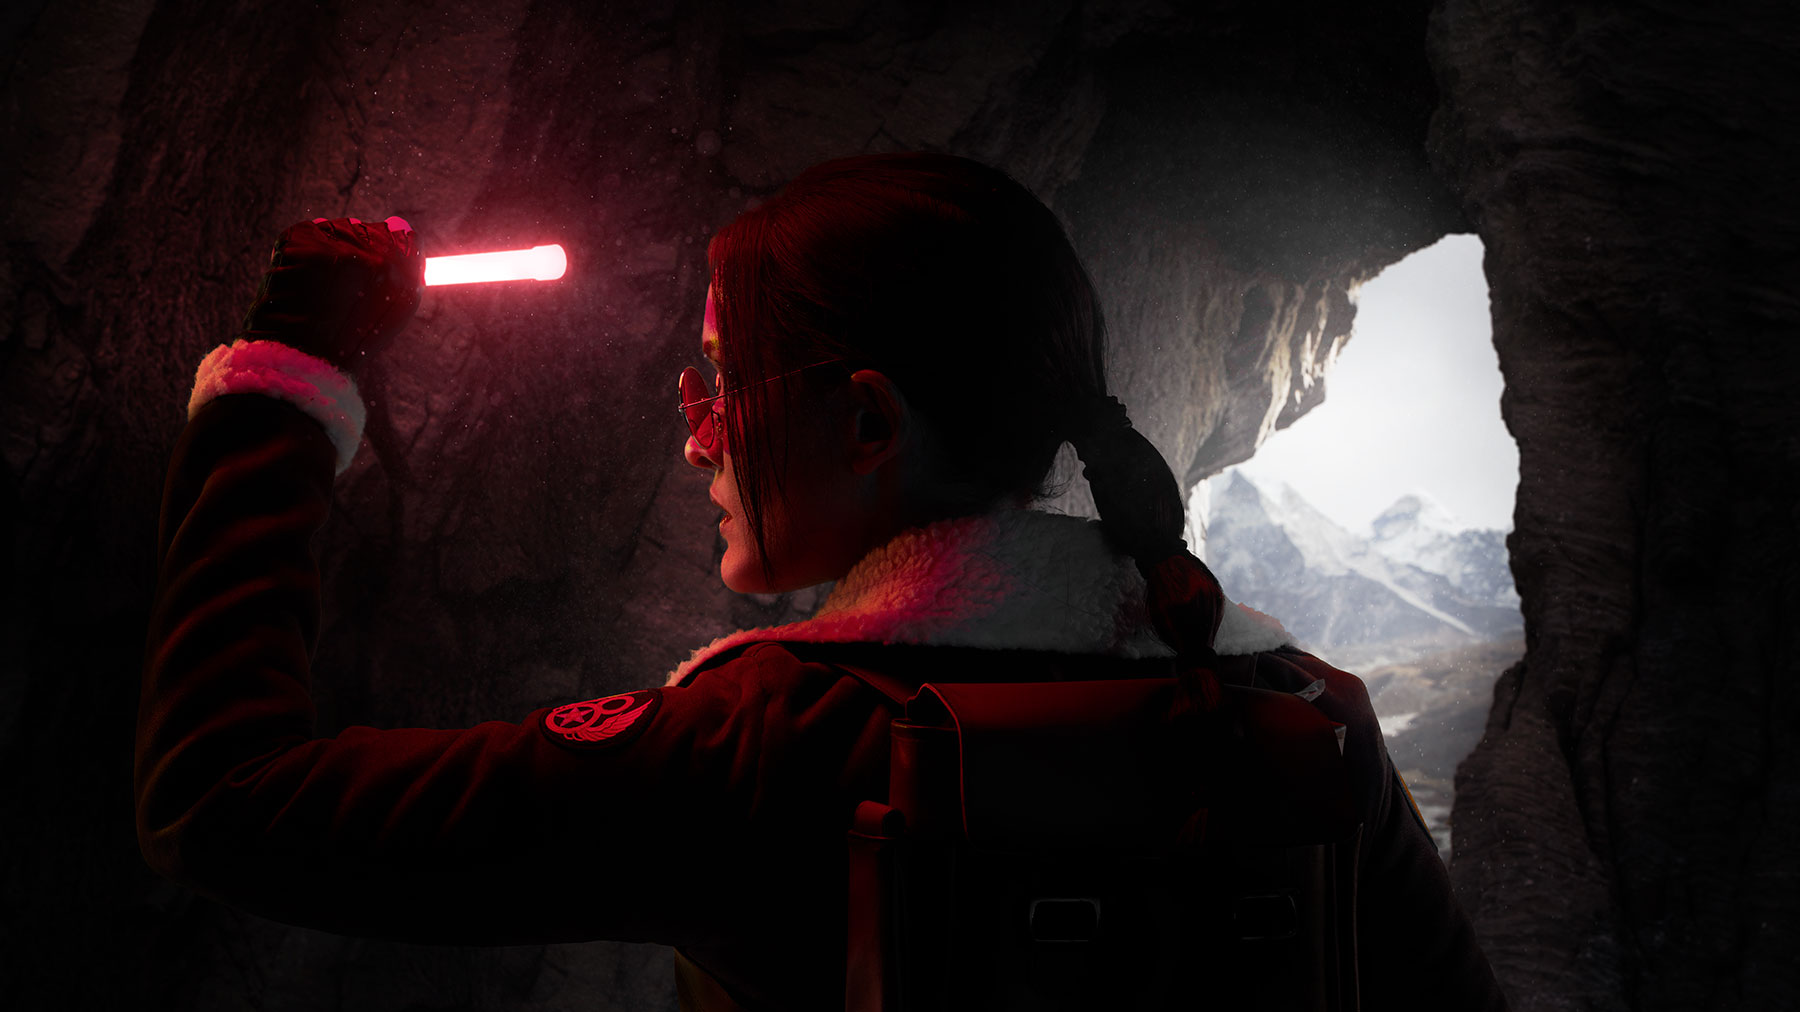 Arthur Sayanoff Tomb Raider 2 04 08